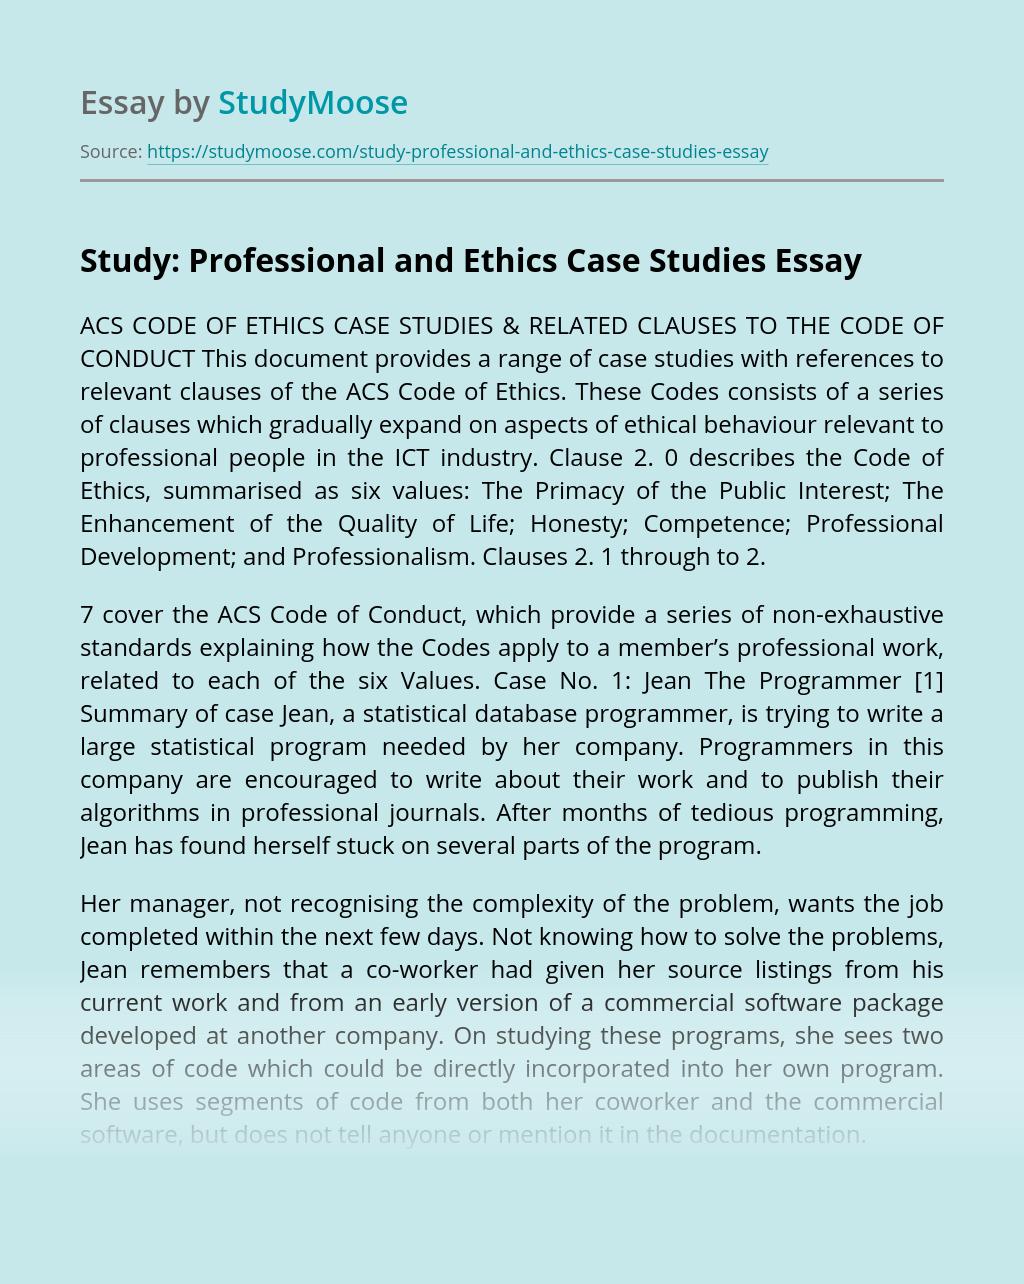 Study: Professional and Ethics Case Studies